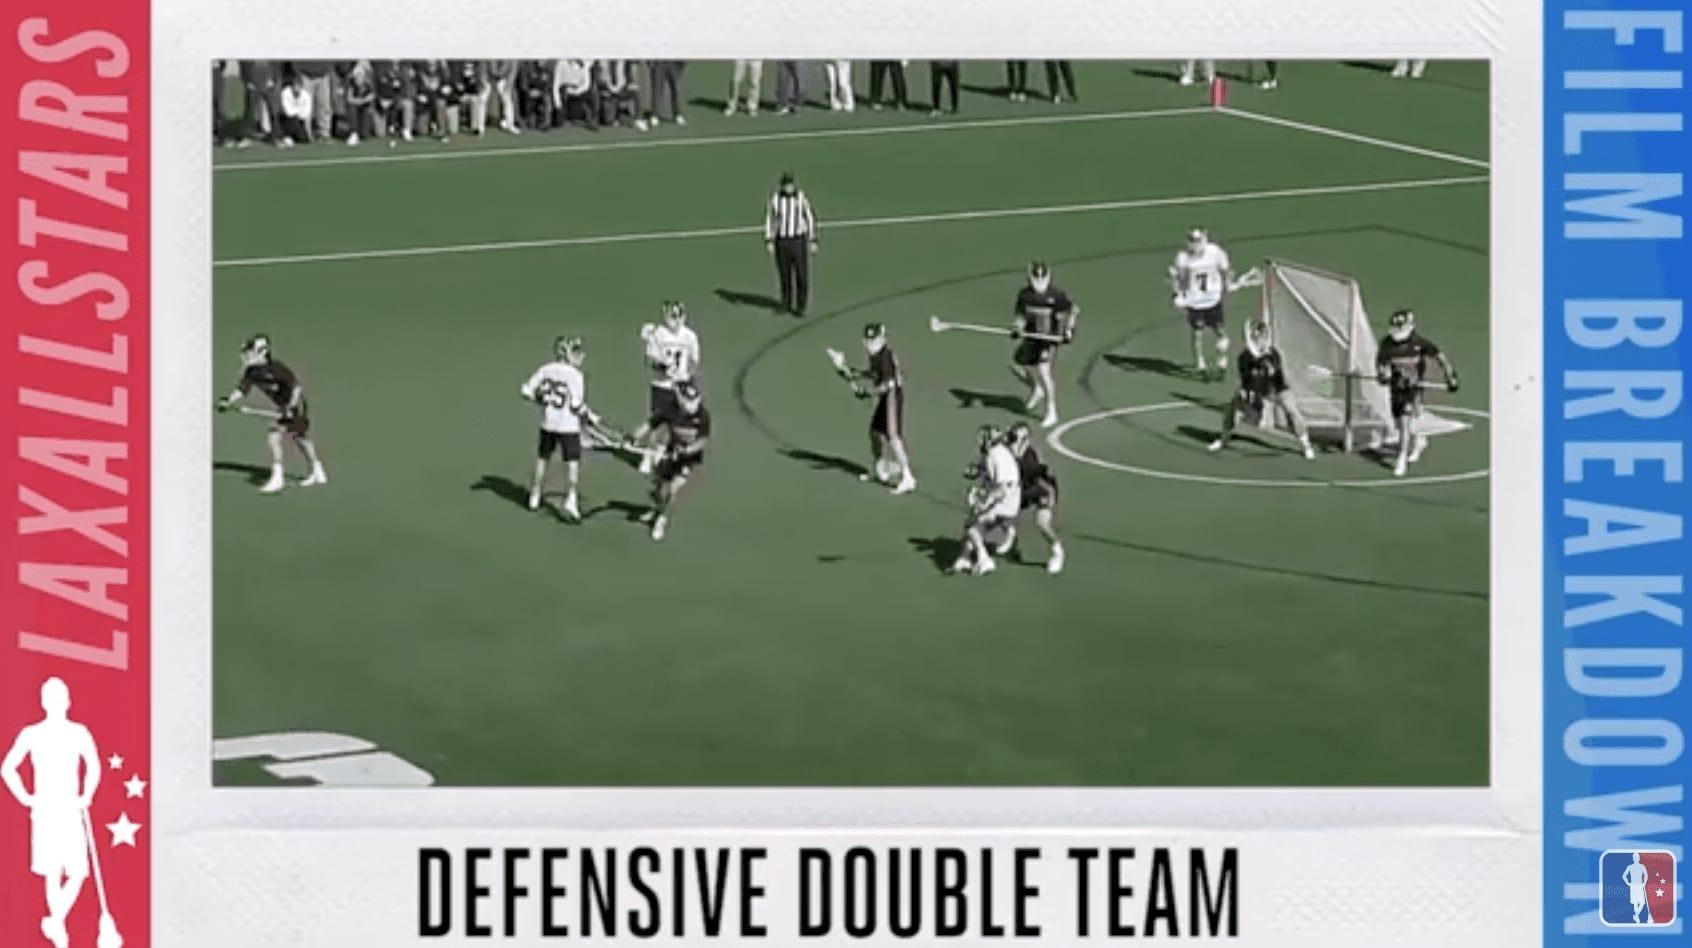 defensive double team